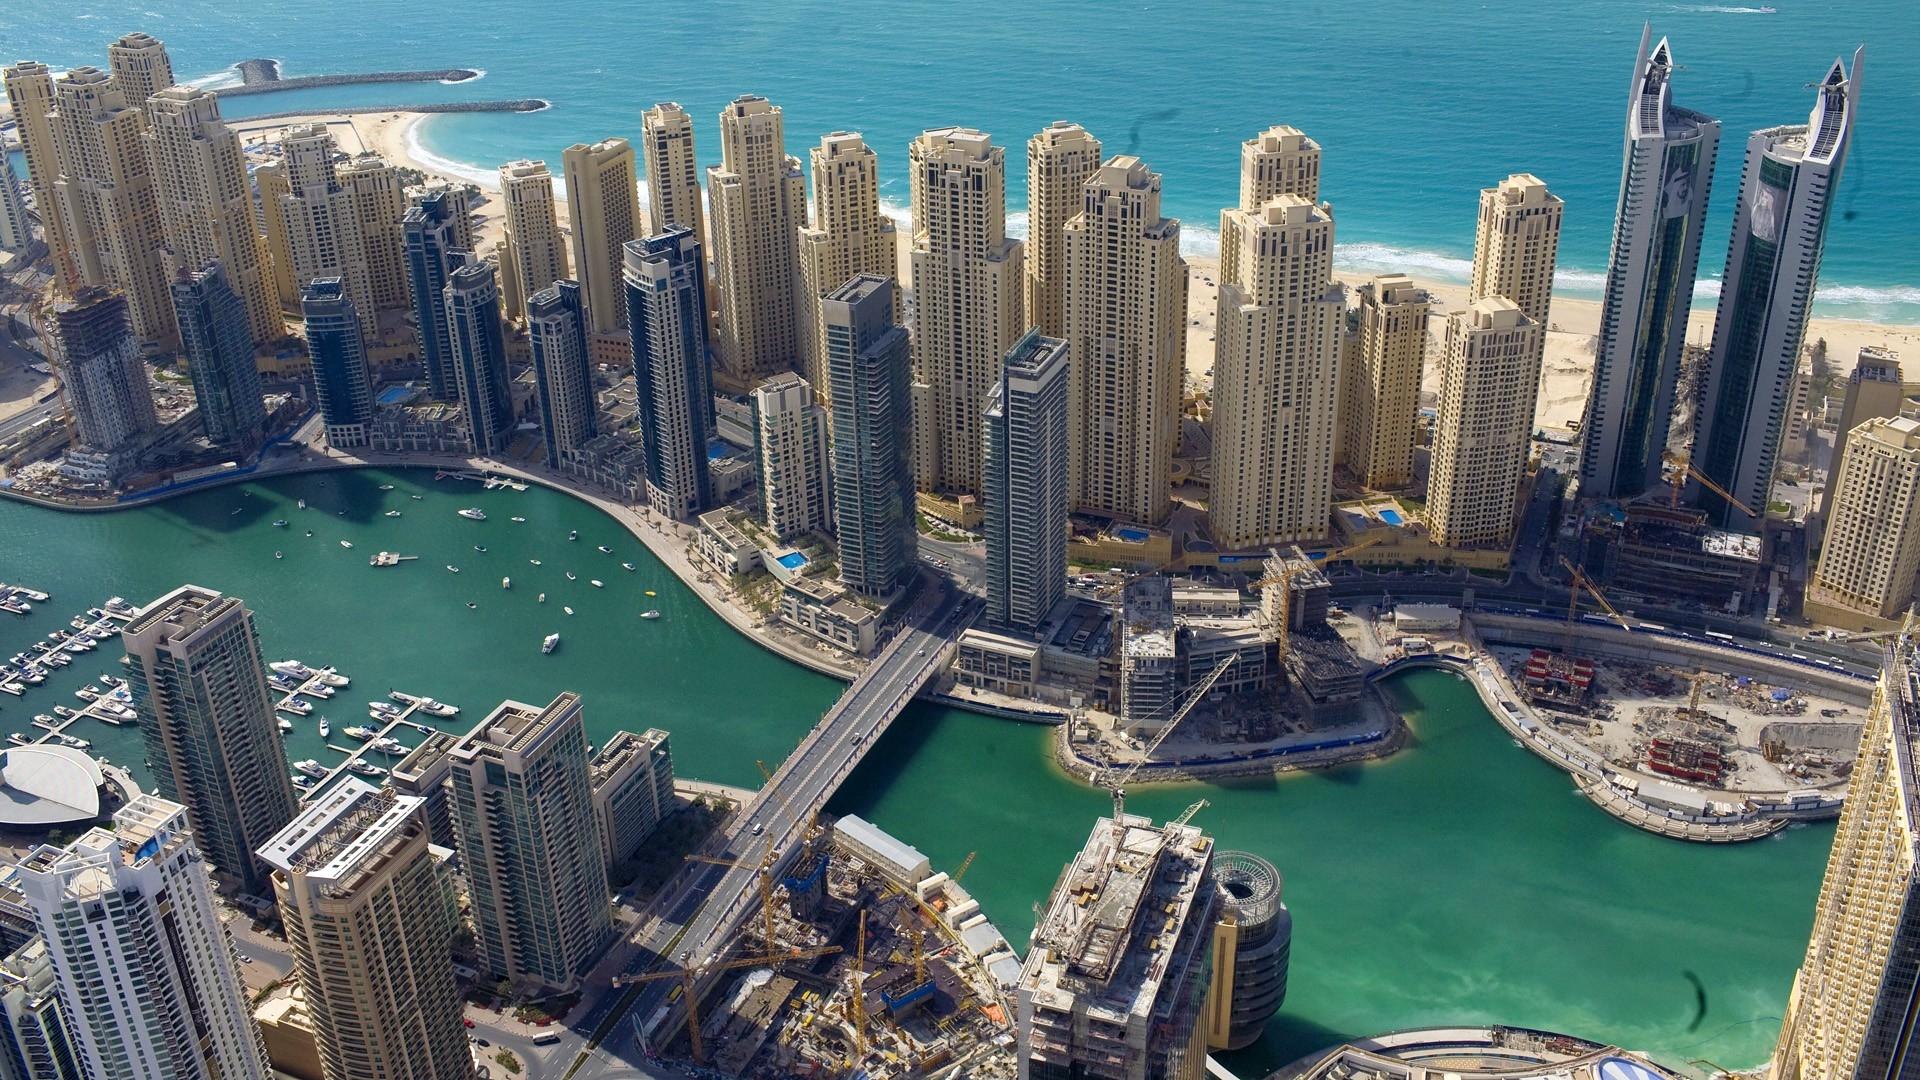 wallpaper : dubai, uae, buildings, skyscrapers, coast, sea, bridge